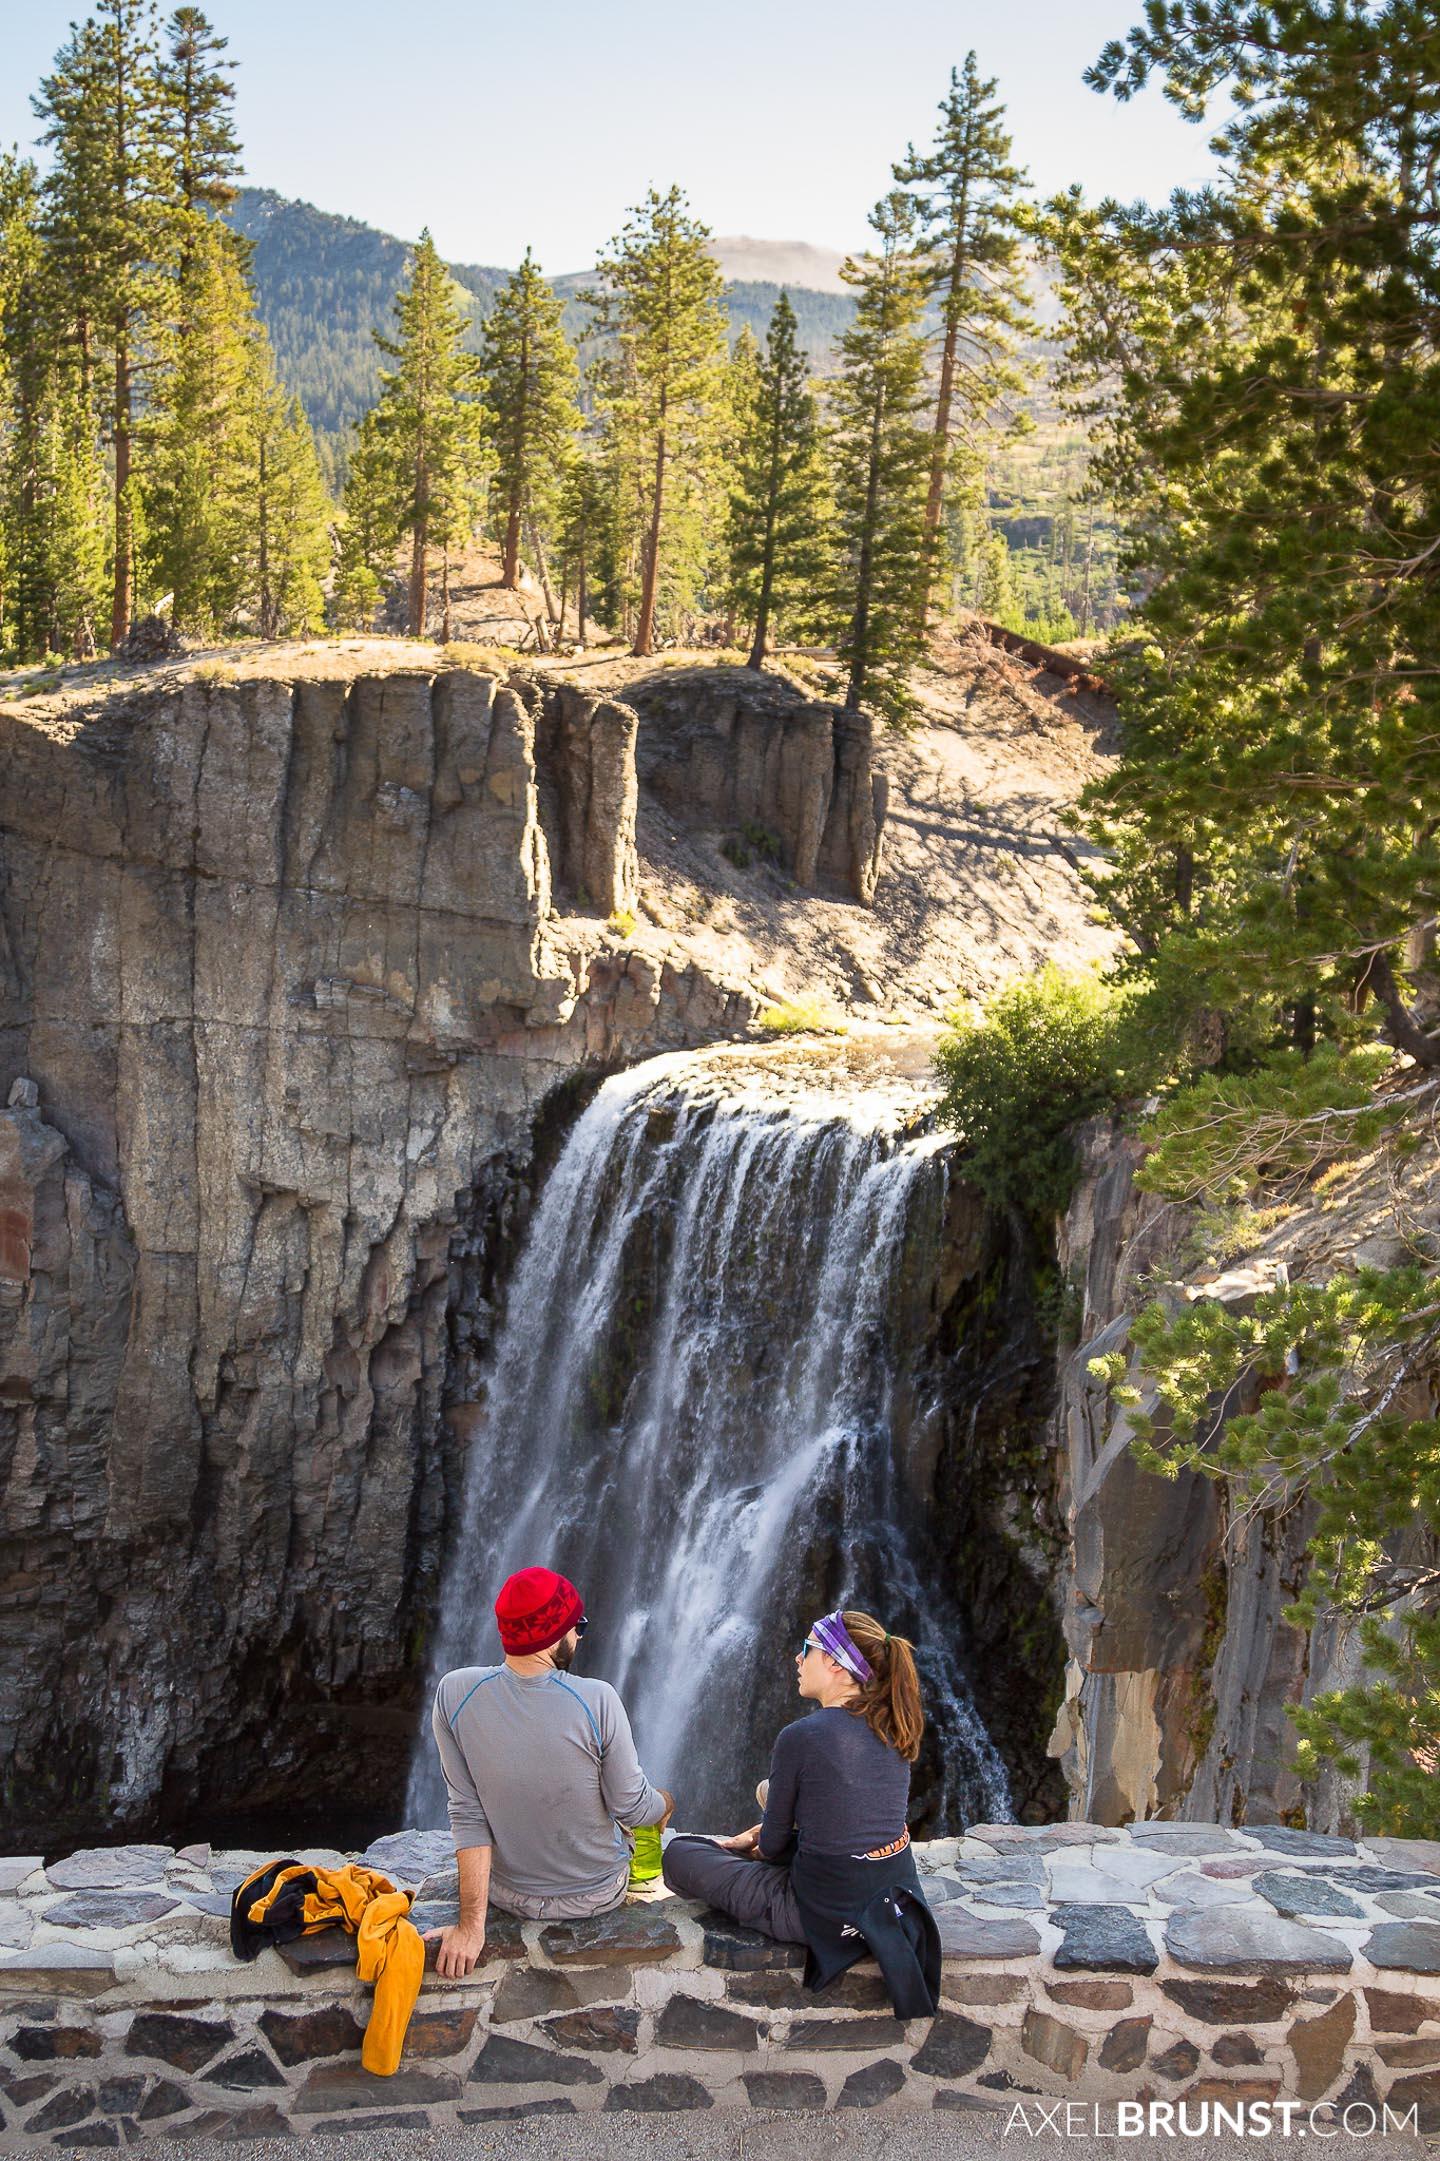 yosemite-national-park-california-7.jpg